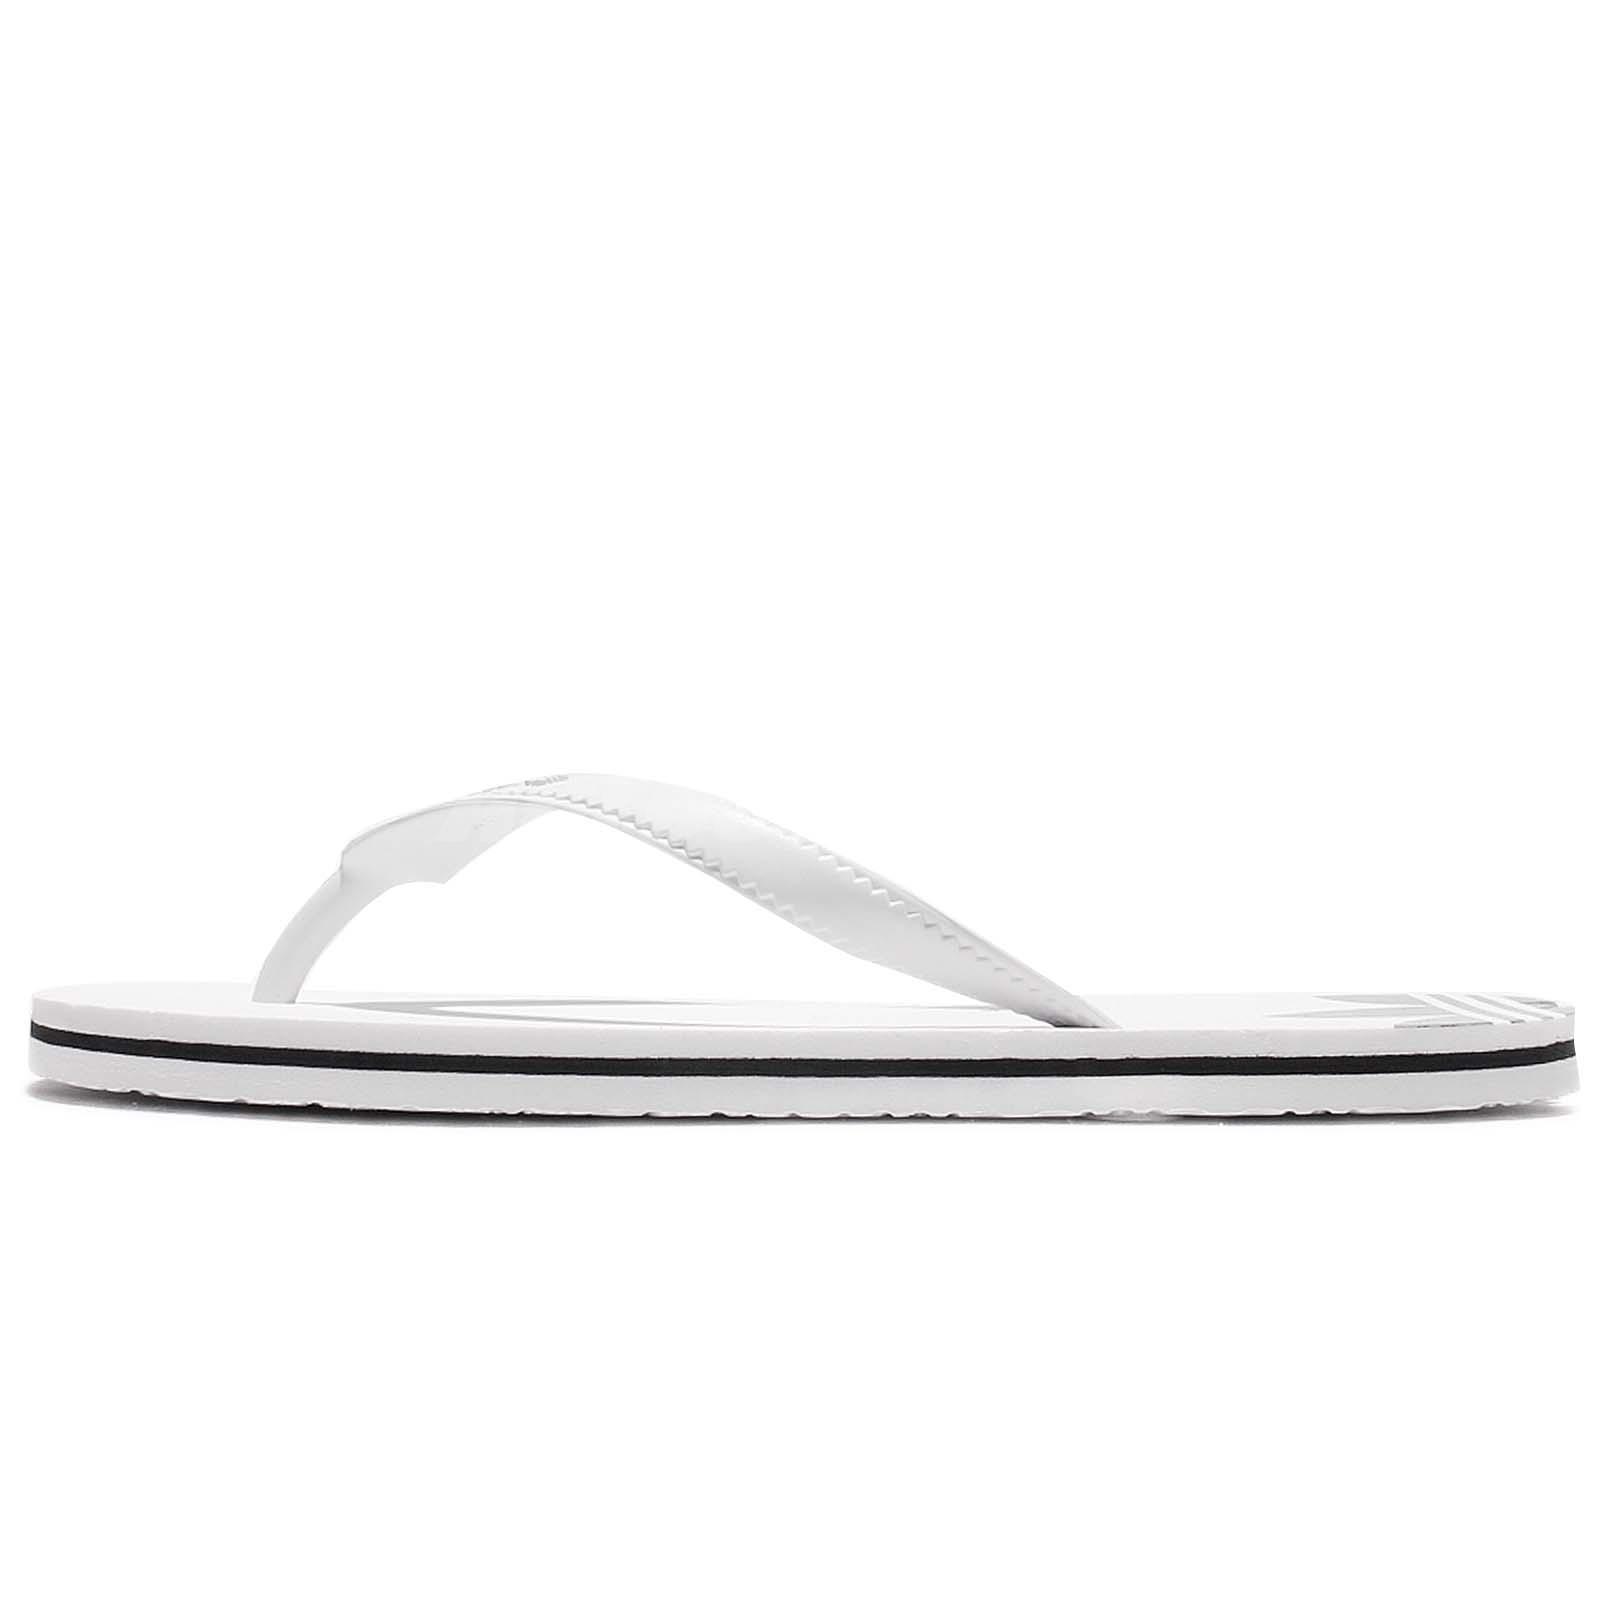 b00820b47 adidas Originals Adisun W White Black Women Sandal Thong Flip-Flop Sandal  BB5105